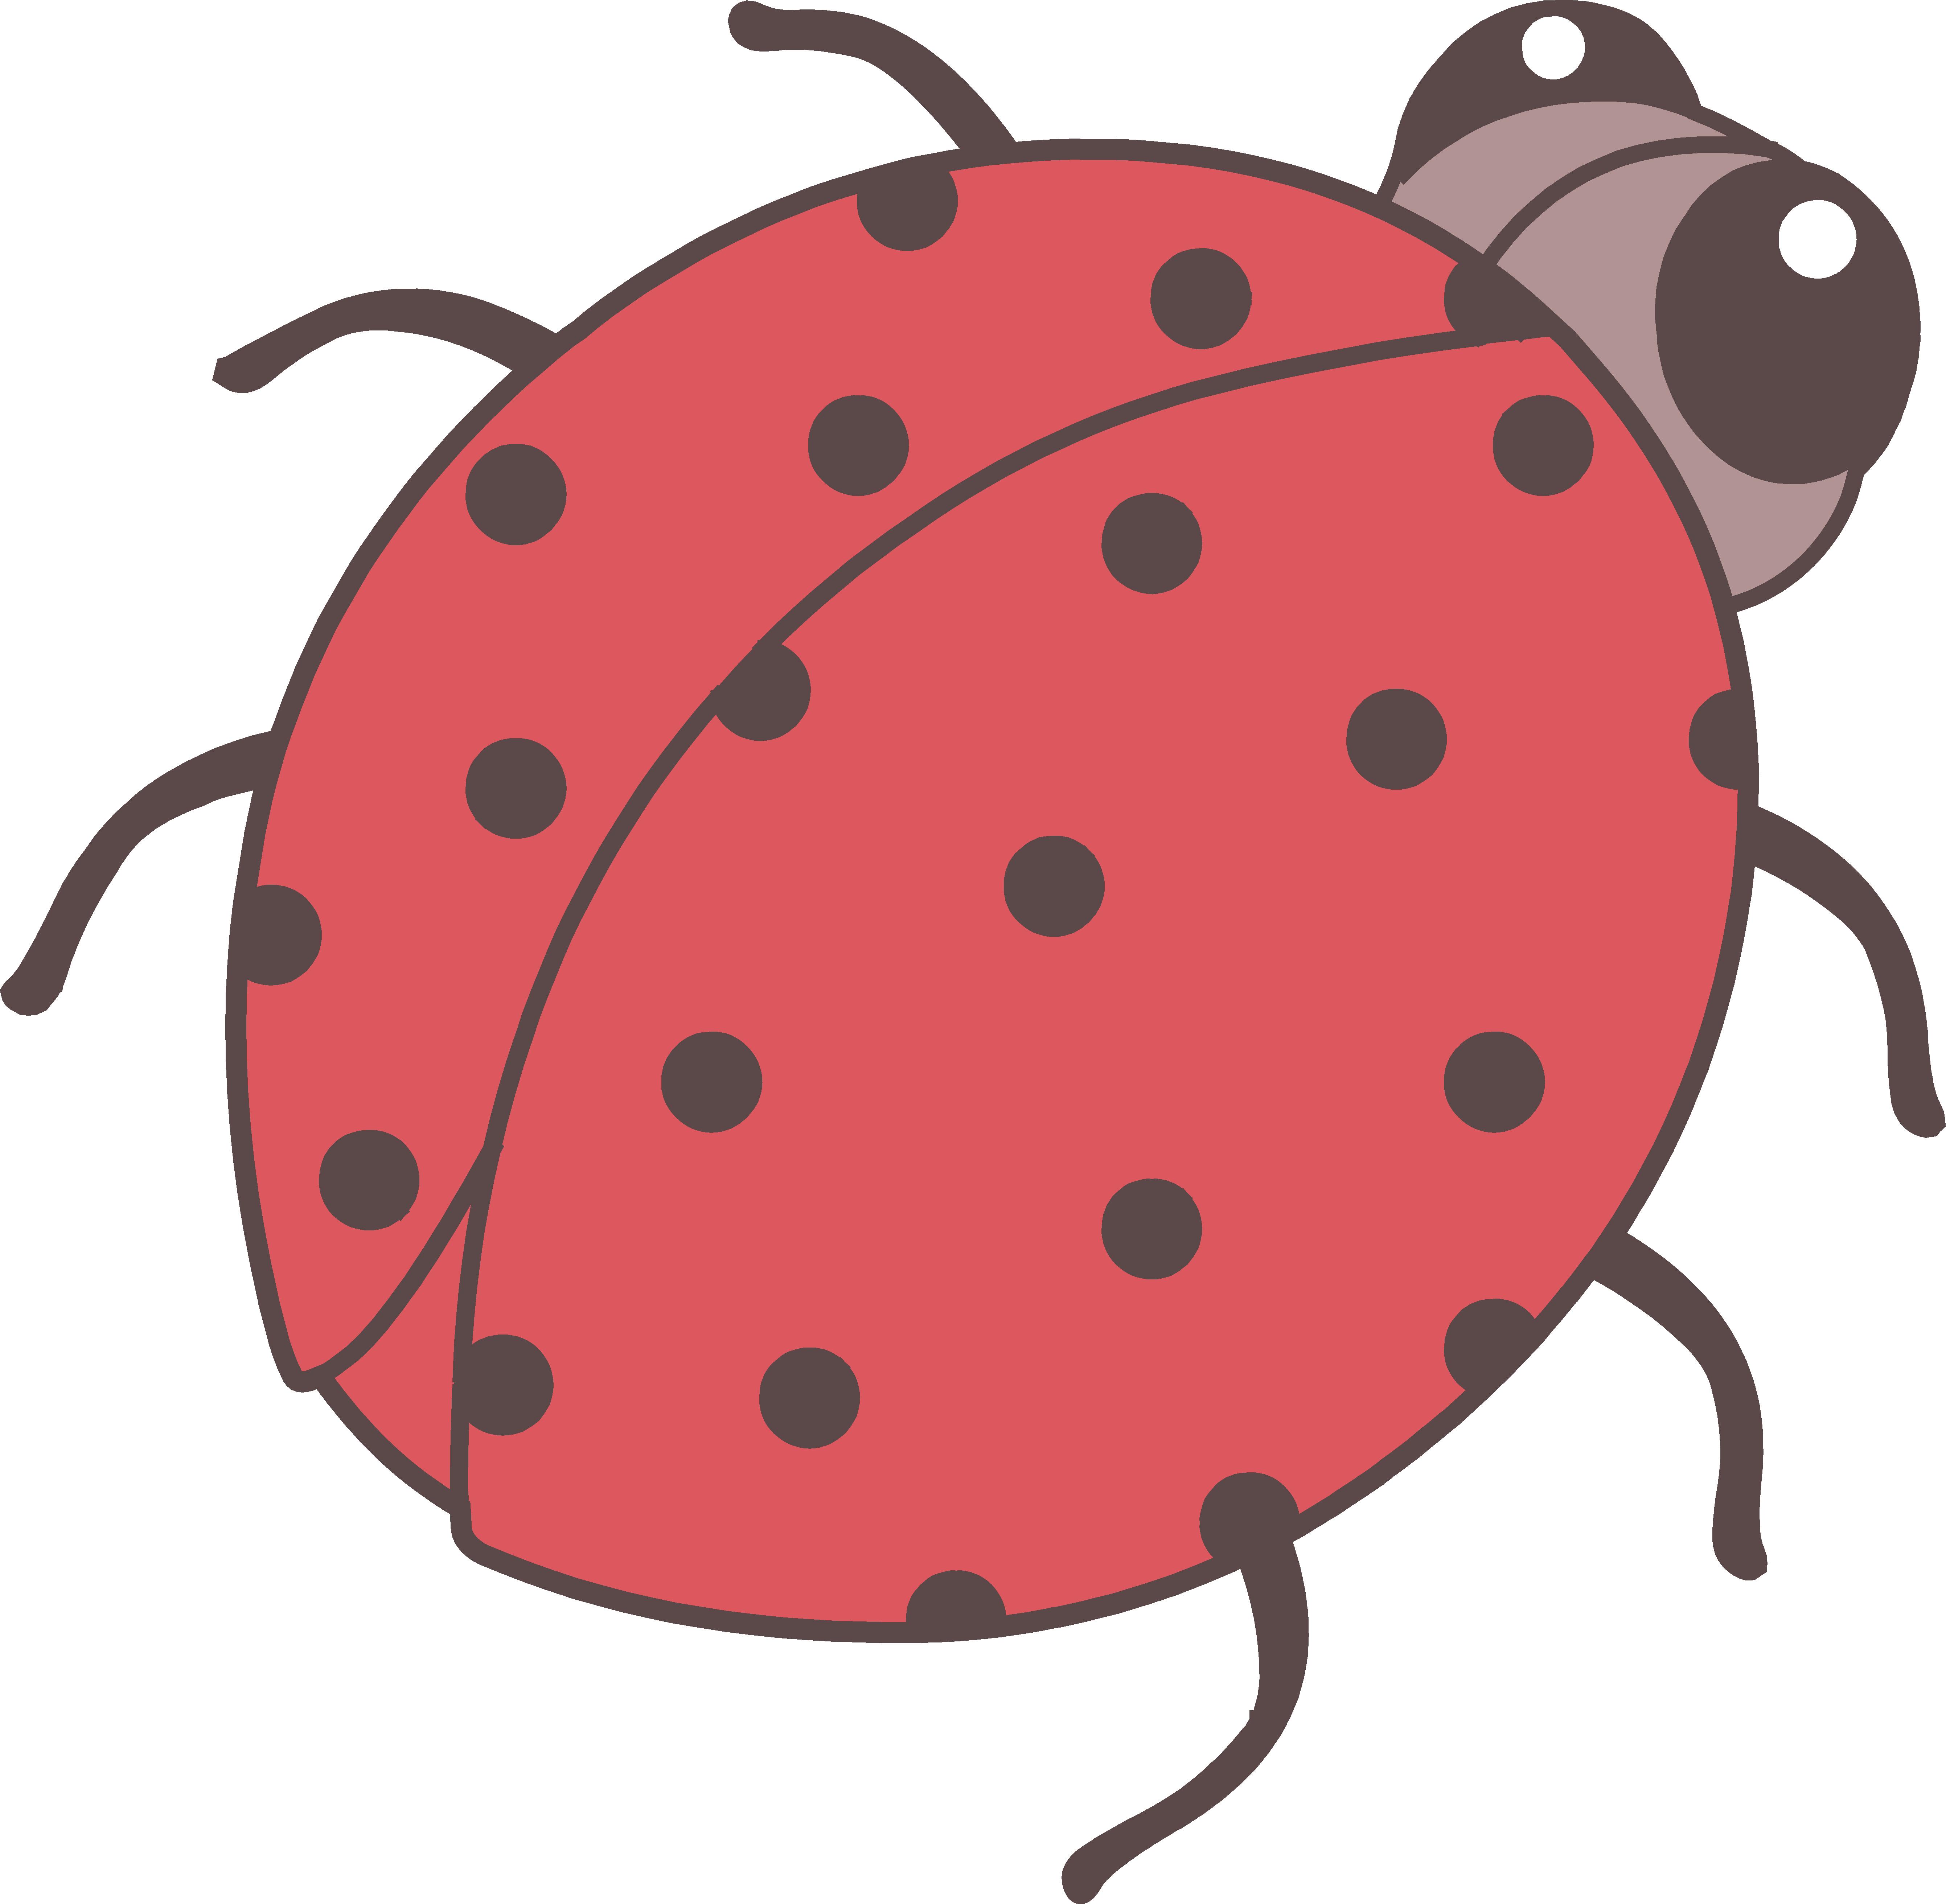 5364x5249 Cute Red Ladybug Clip Art